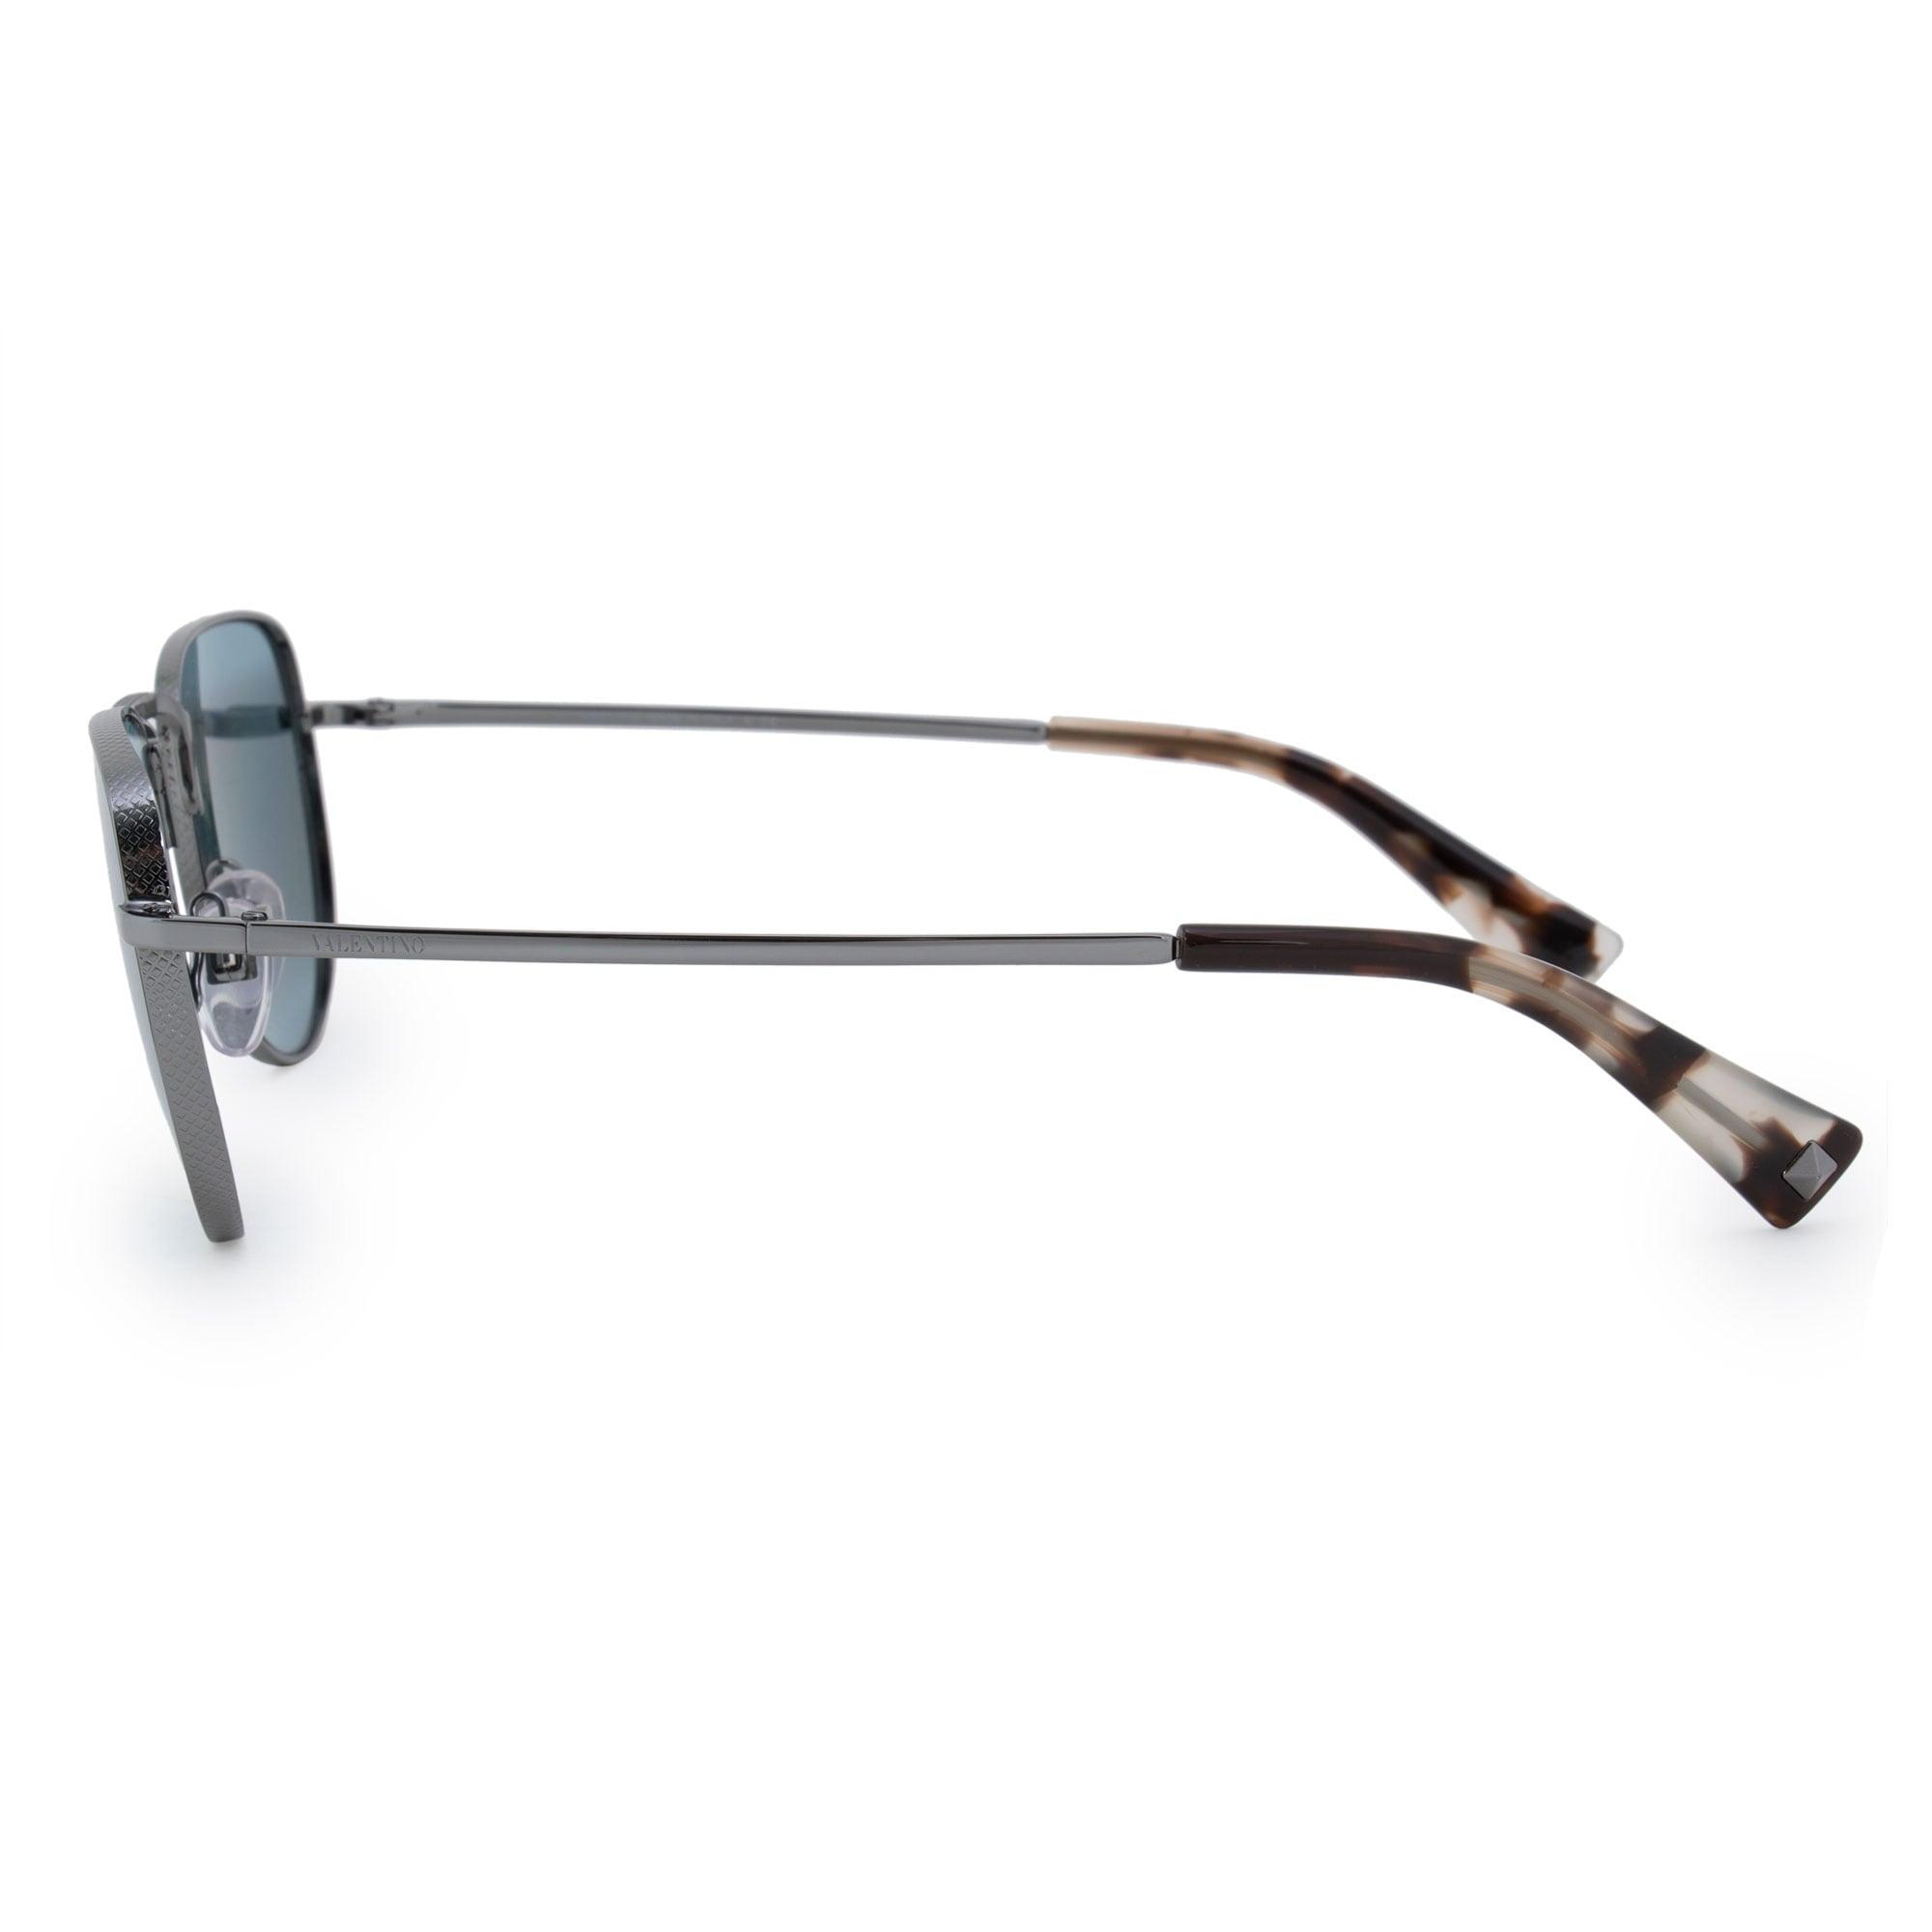 30eecd2773 Shop Valentino Square Sunglasses VA2012 30057C 49 - Free Shipping Today -  Overstock - 23138792